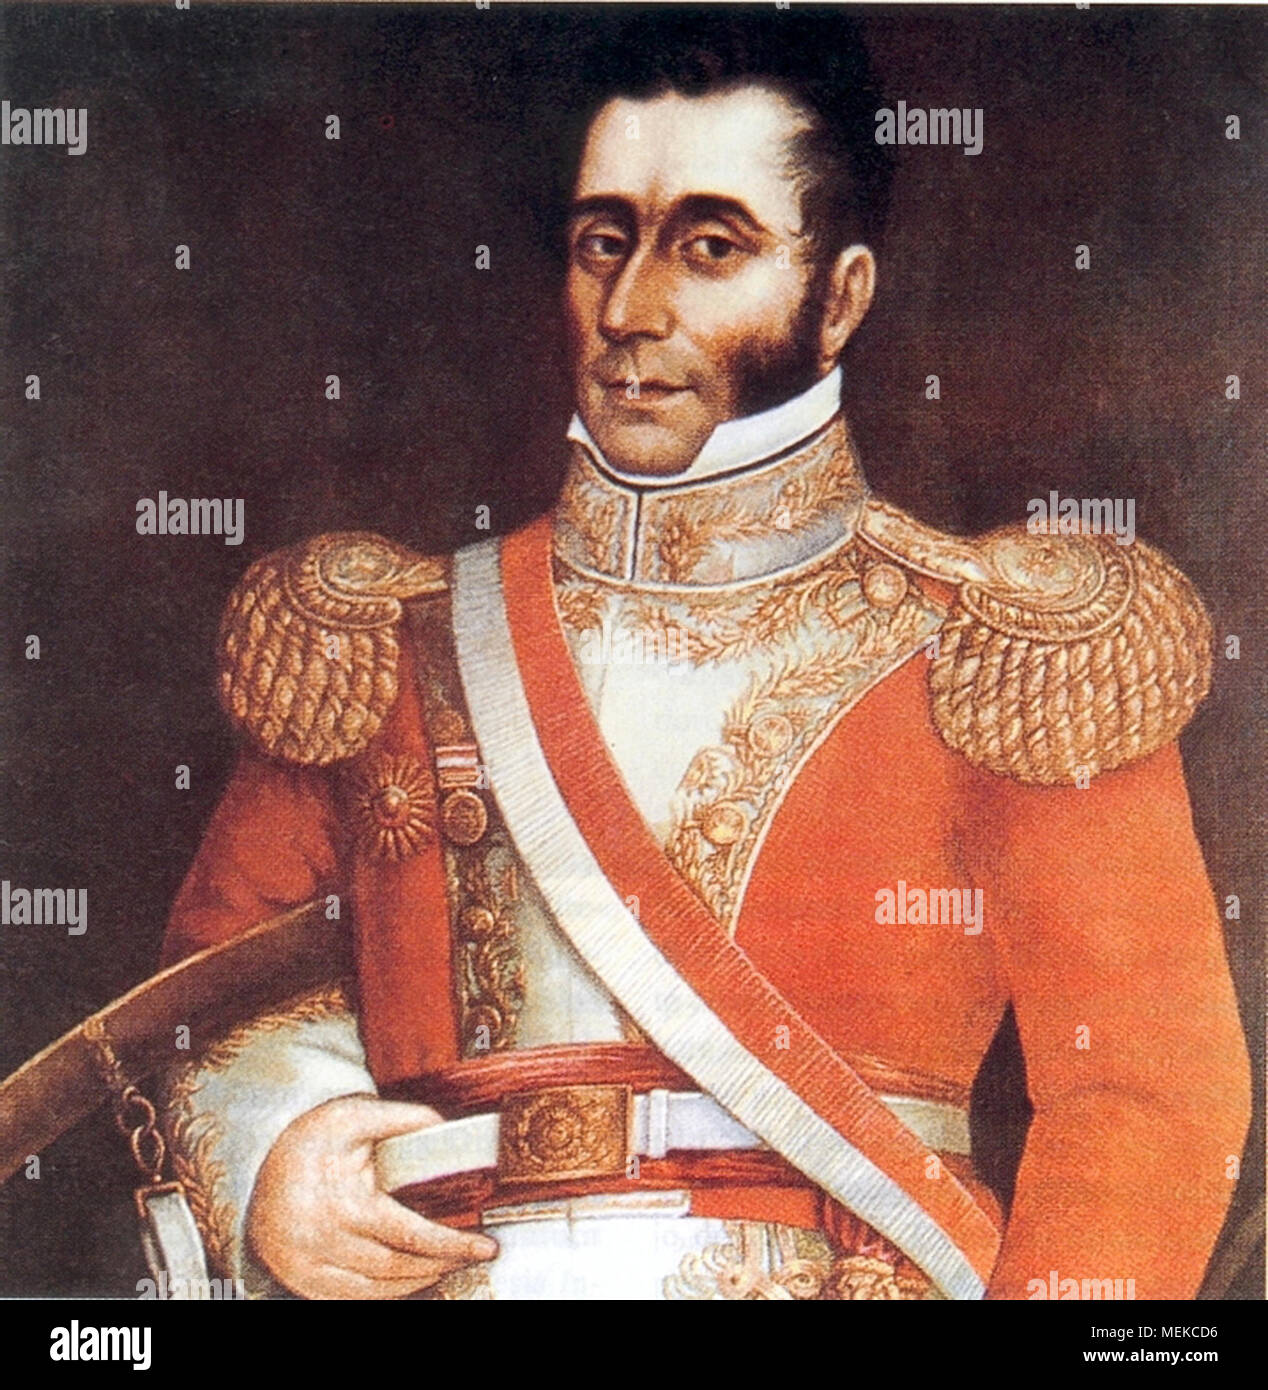 José Bernardo de Tagle y Portocarrero, the iv Marquis of Torre Tagle (1779 - 1825), Peruvian soldier and politician who served as the Interim President of Peru in 1823 as well as the fifth President of Peru from 1823 to 1824. - Stock Image